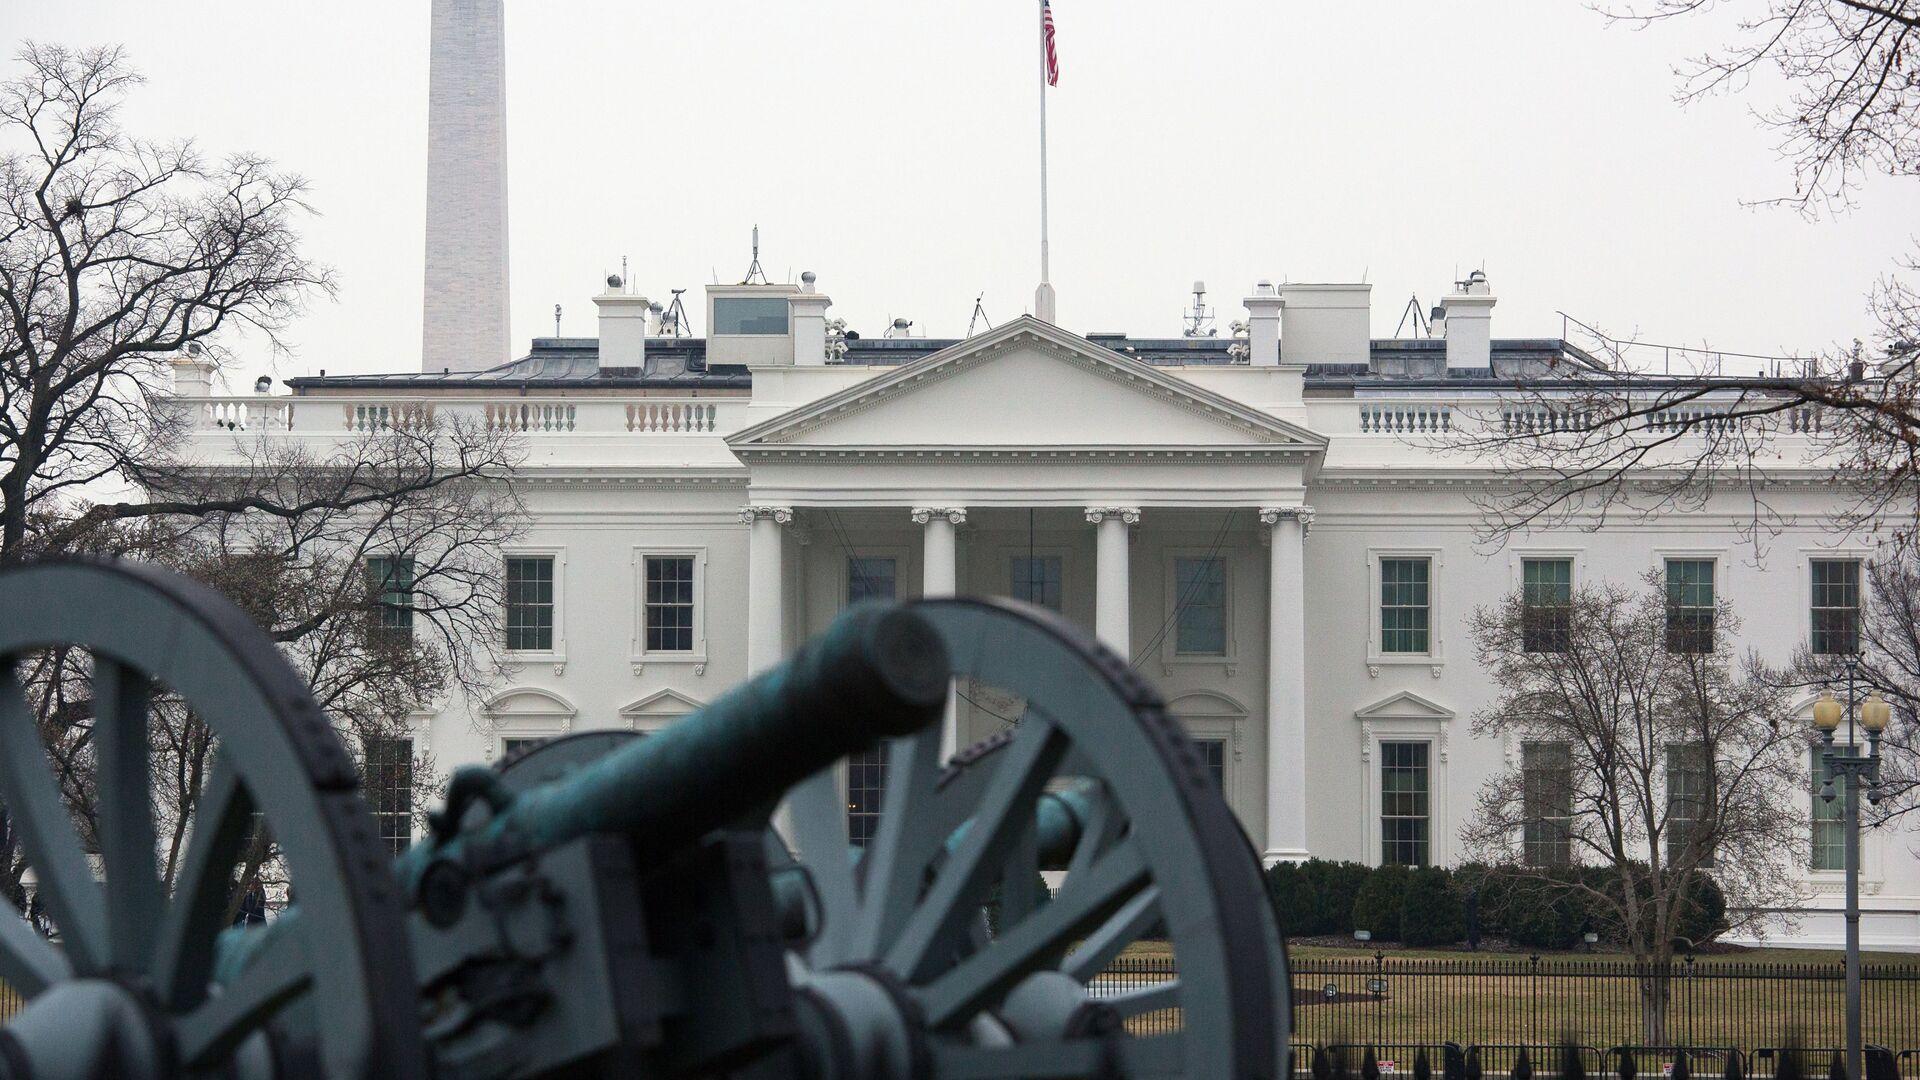 Белый дом в Вашингтоне - Sputnik Latvija, 1920, 18.09.2021